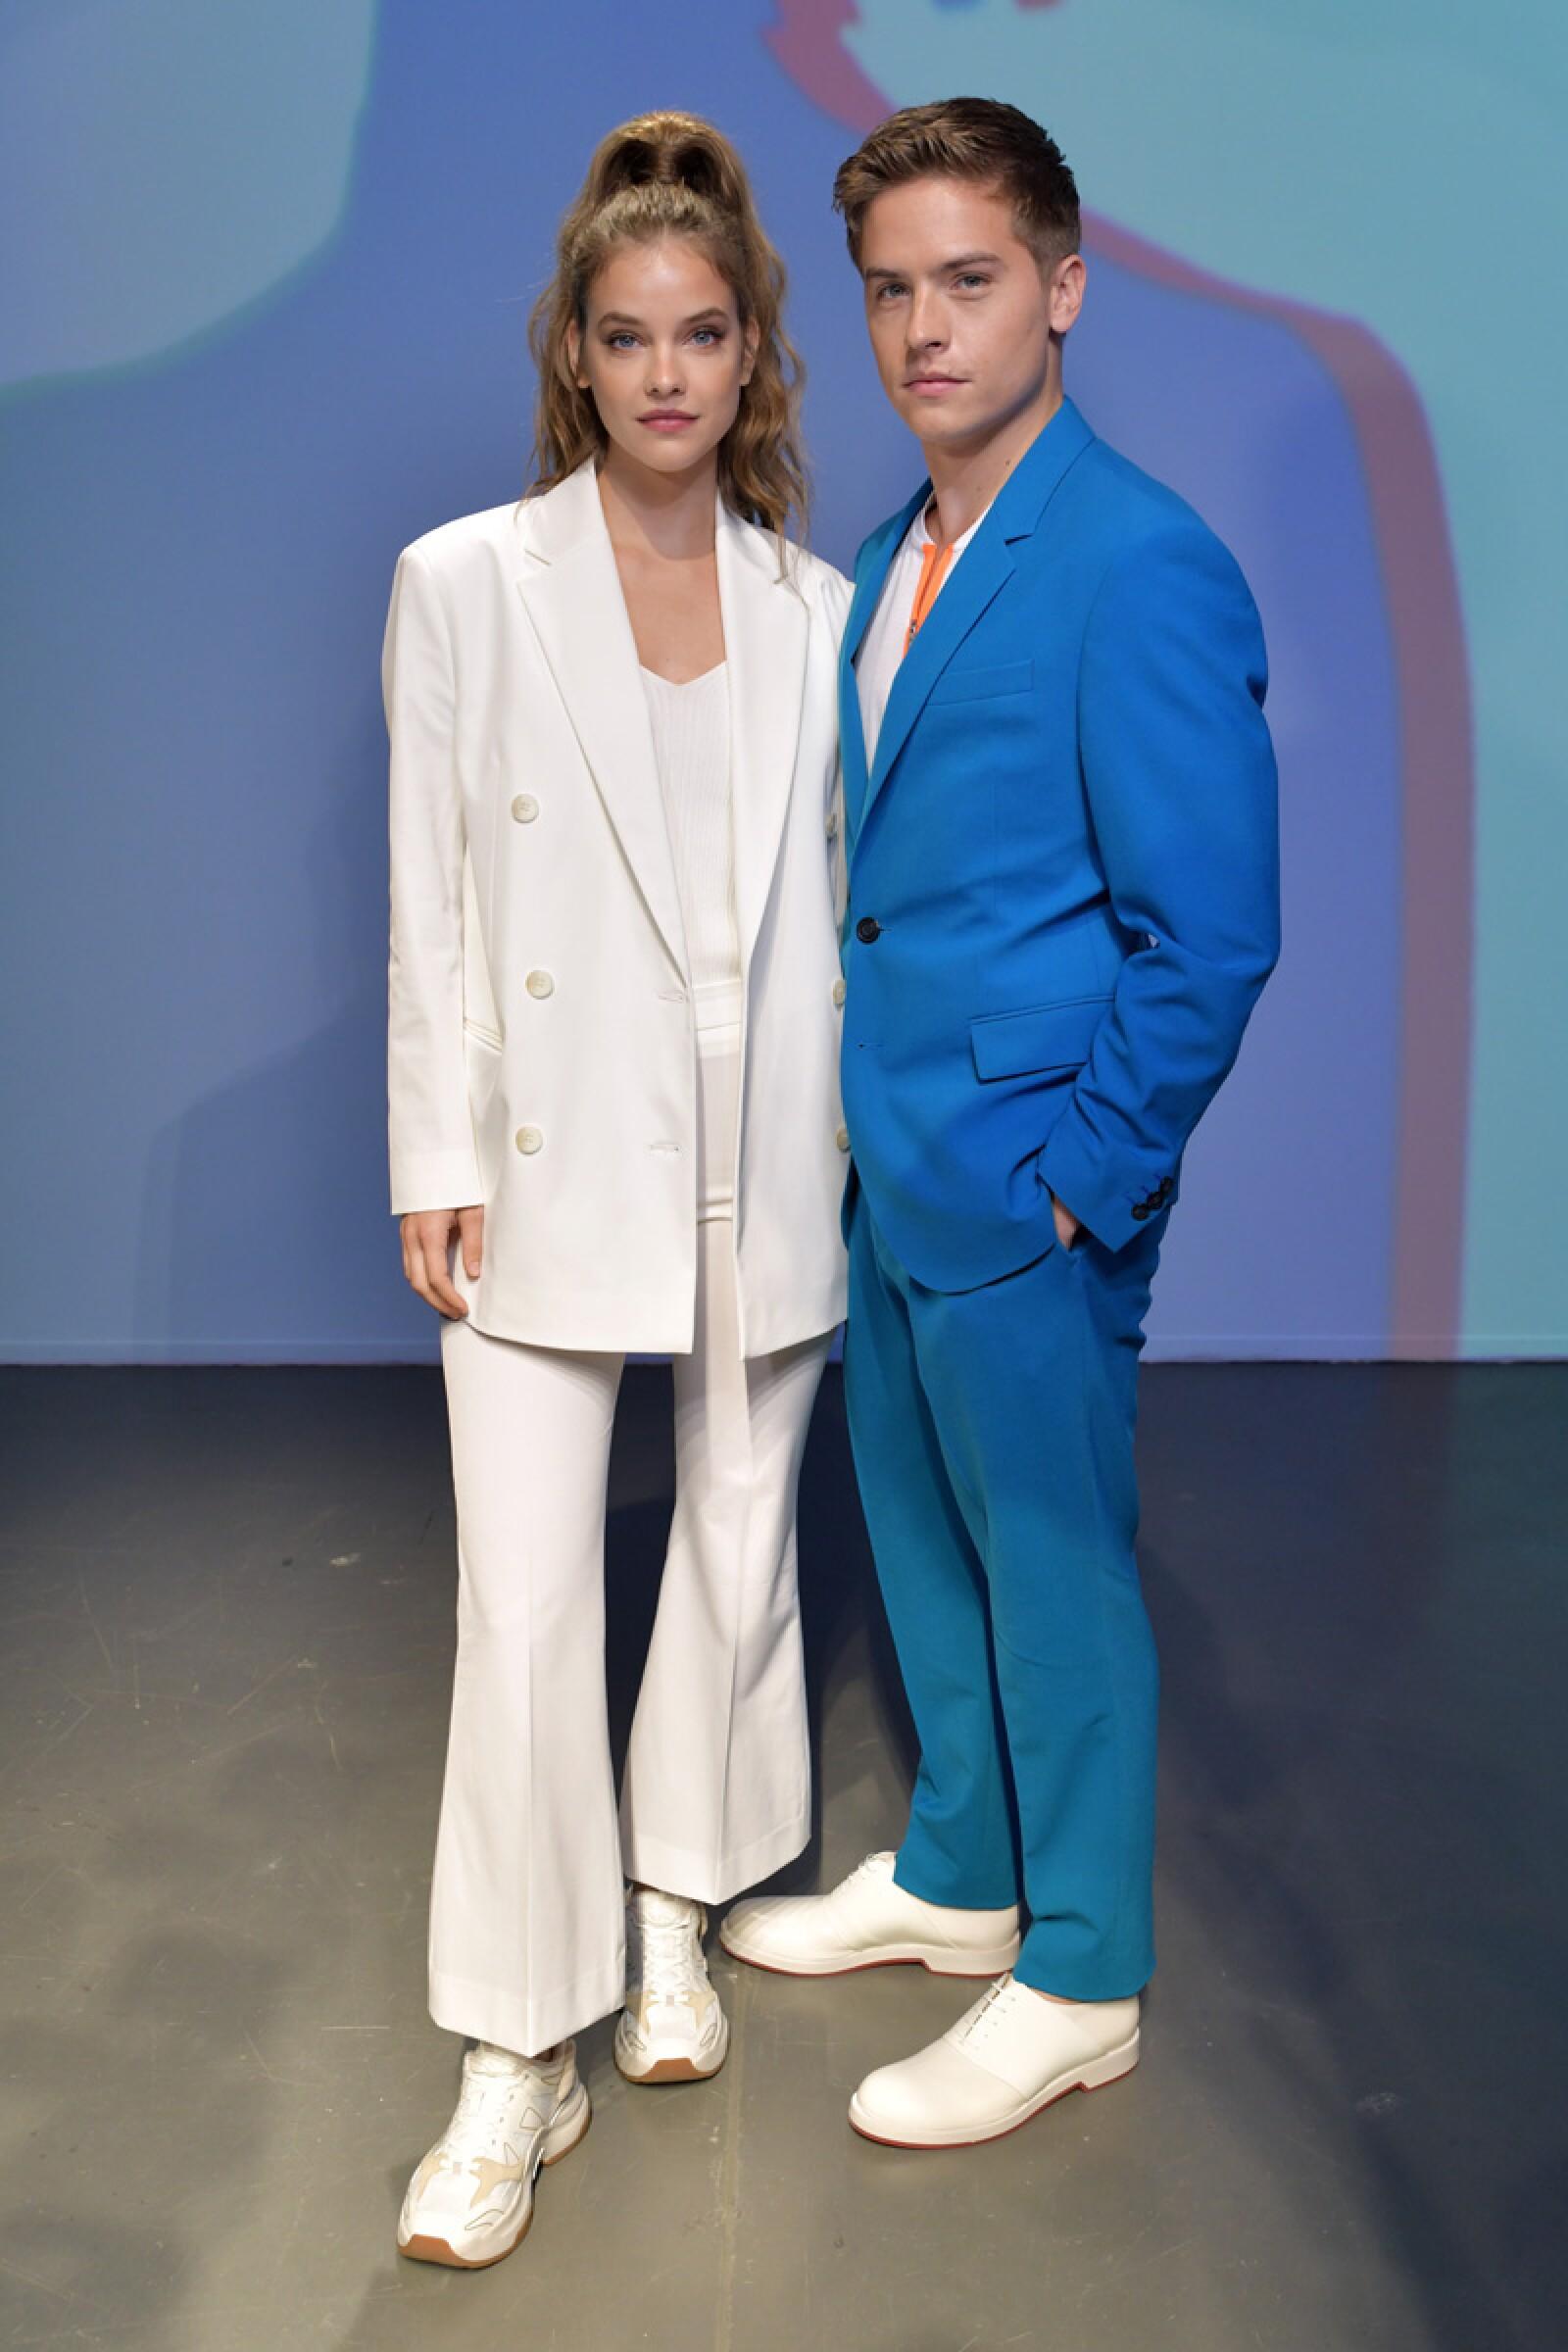 Boss show, Front Row, Spring Summer 2020, Milan Fashion Week, Italy - 22 Sep 2019